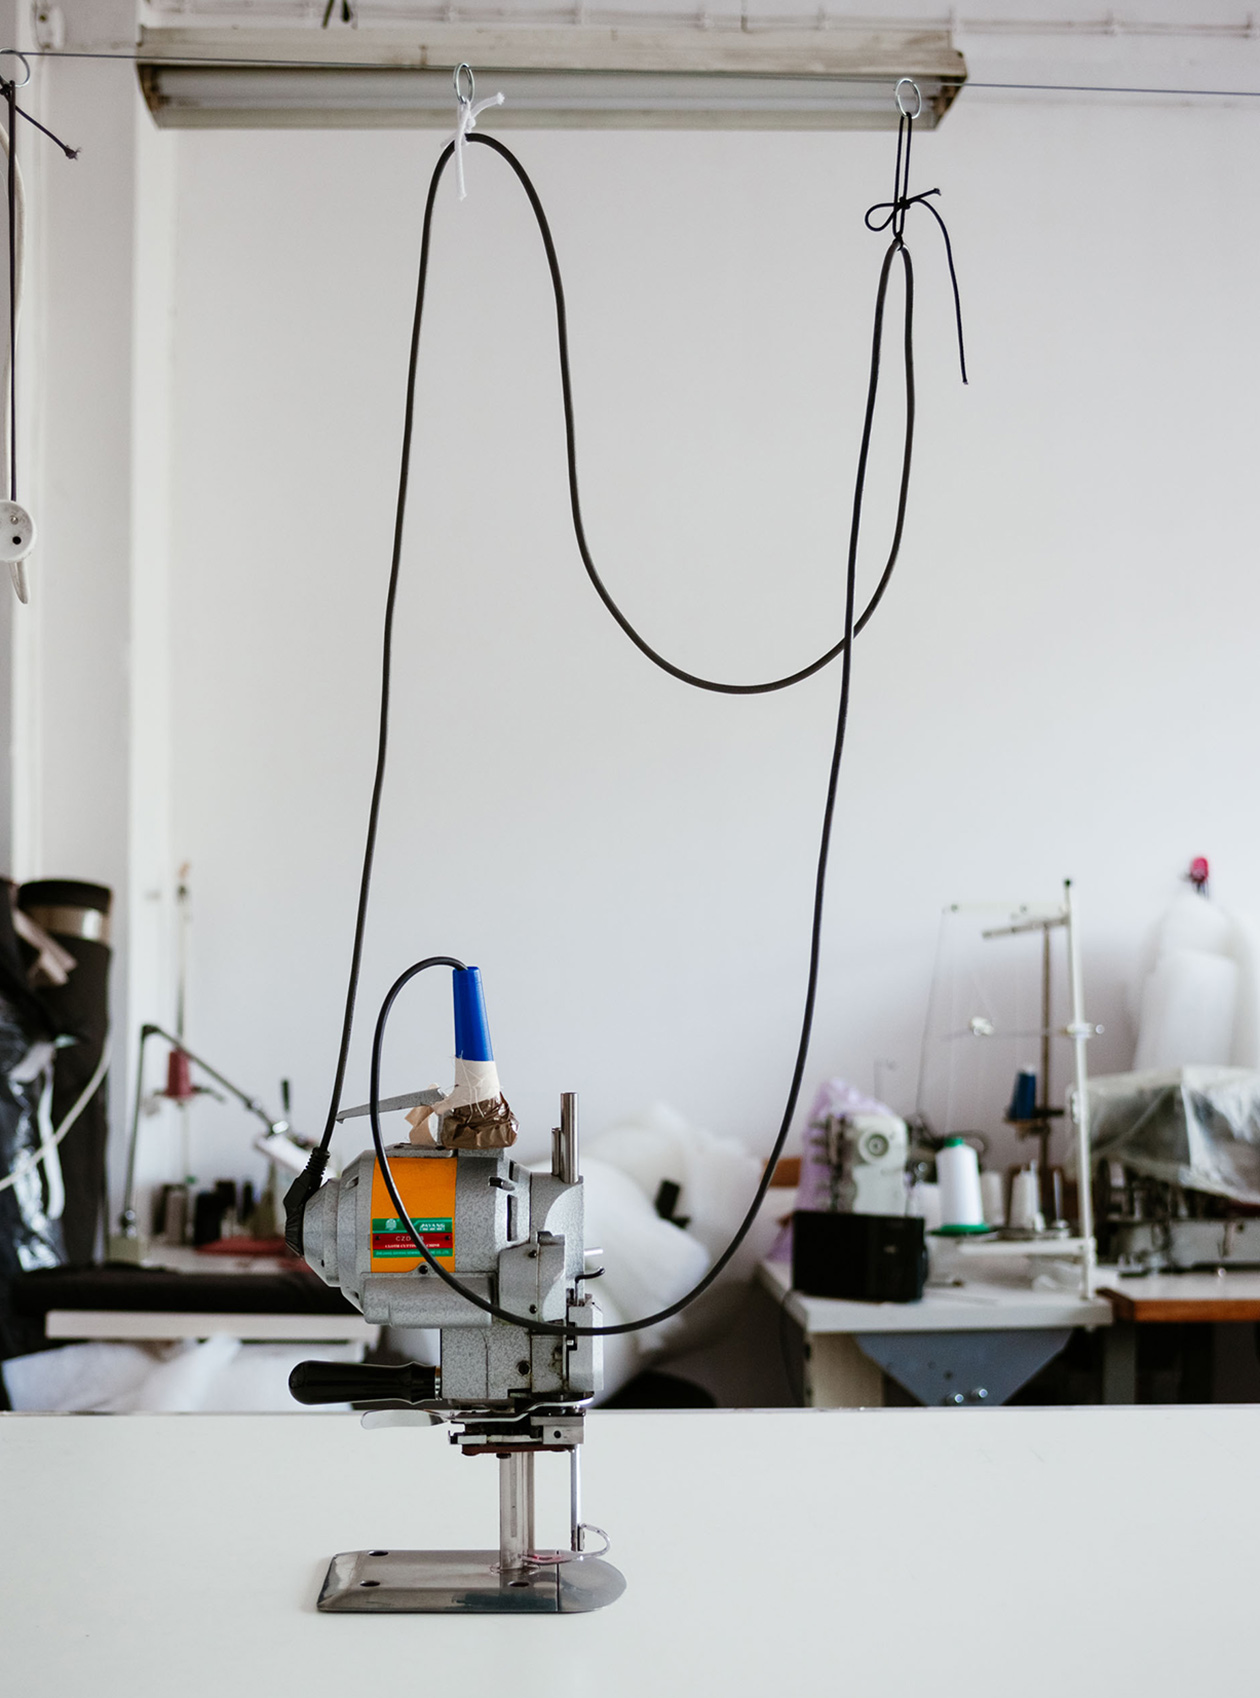 Elementy production process